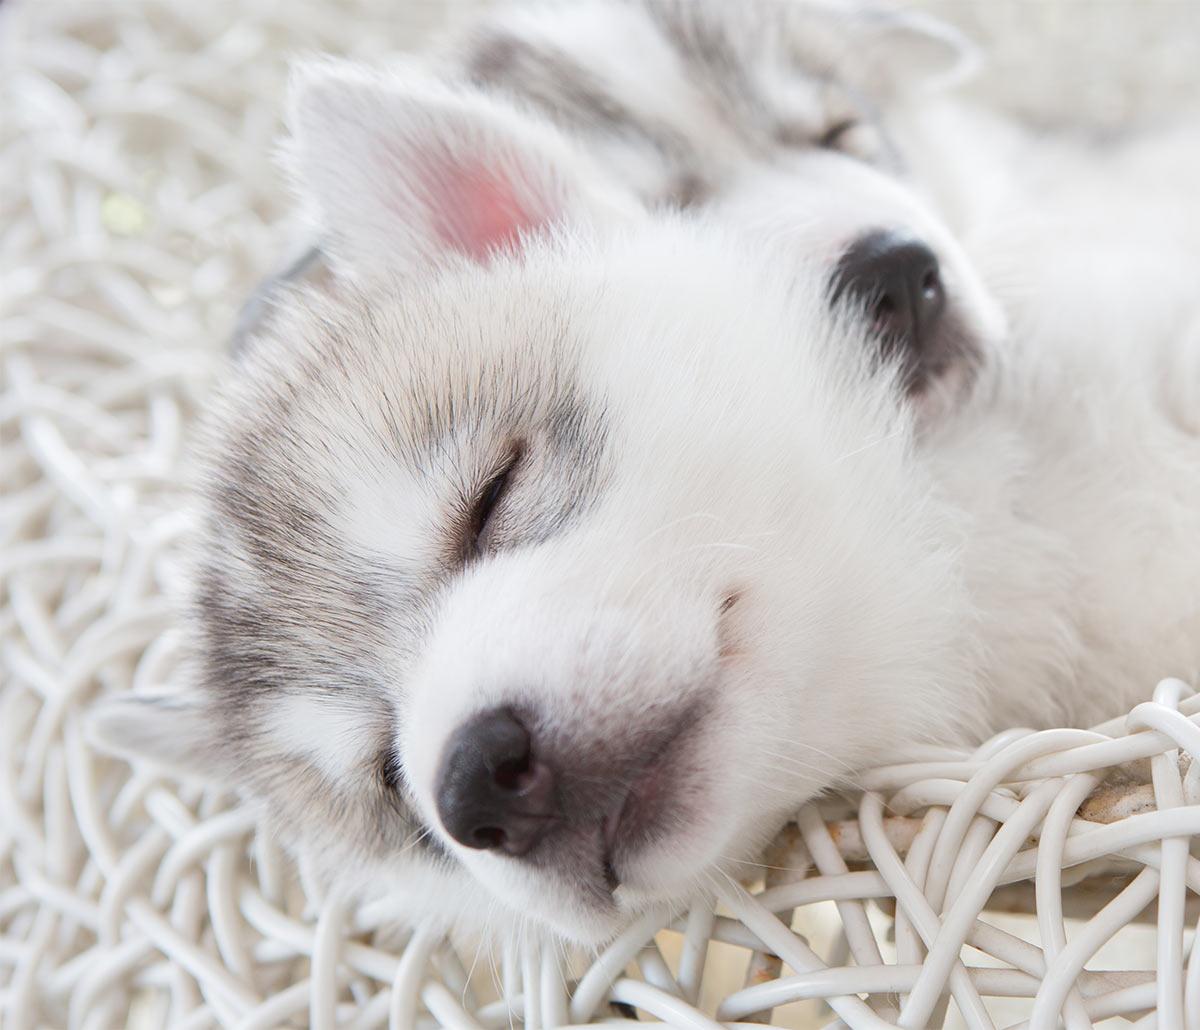 Husky puppy photos